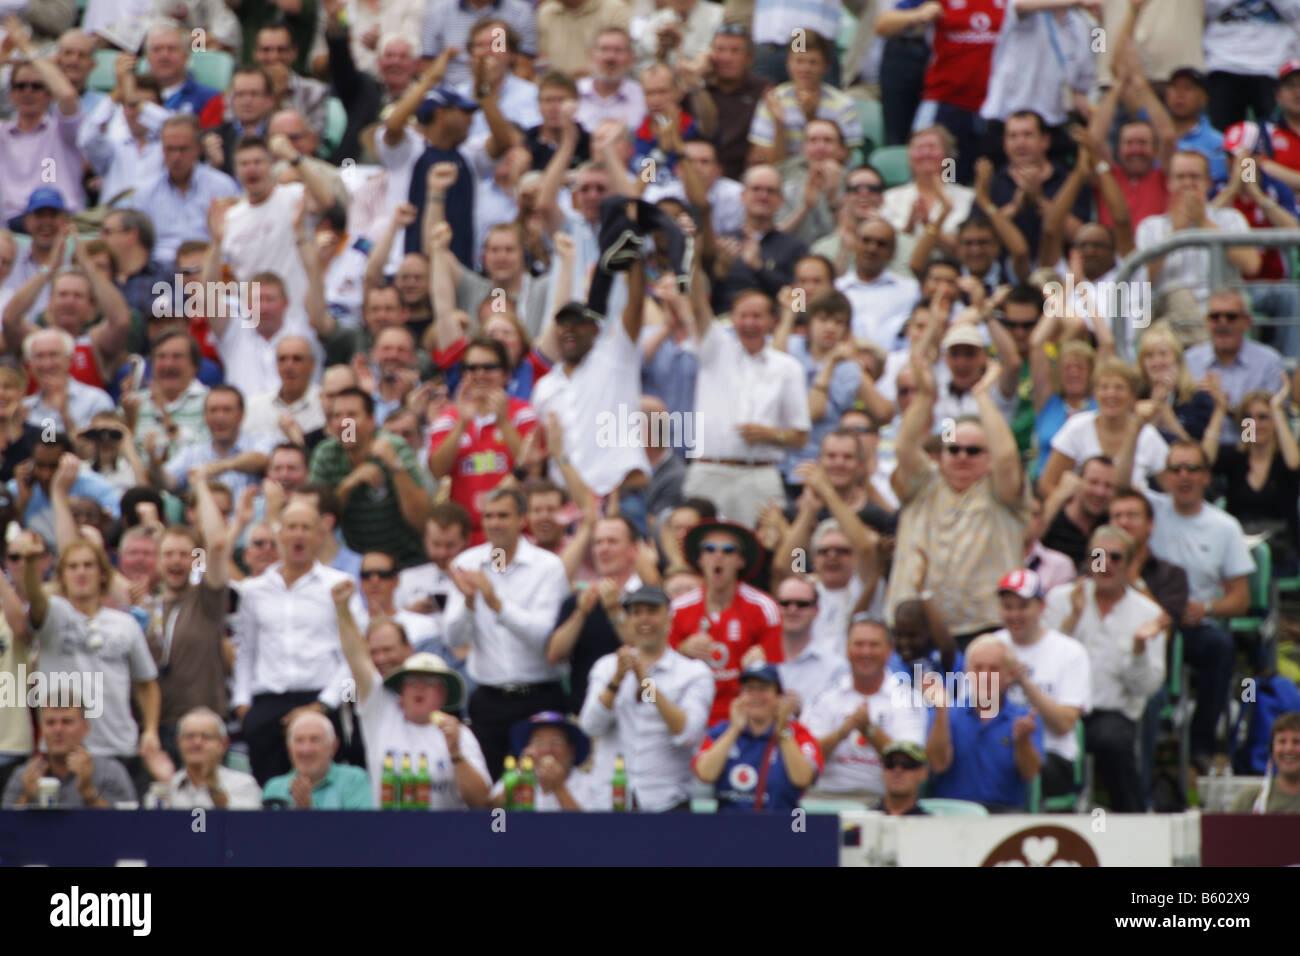 'Out of focus' sports fans de cricket supporters floue Photo Stock